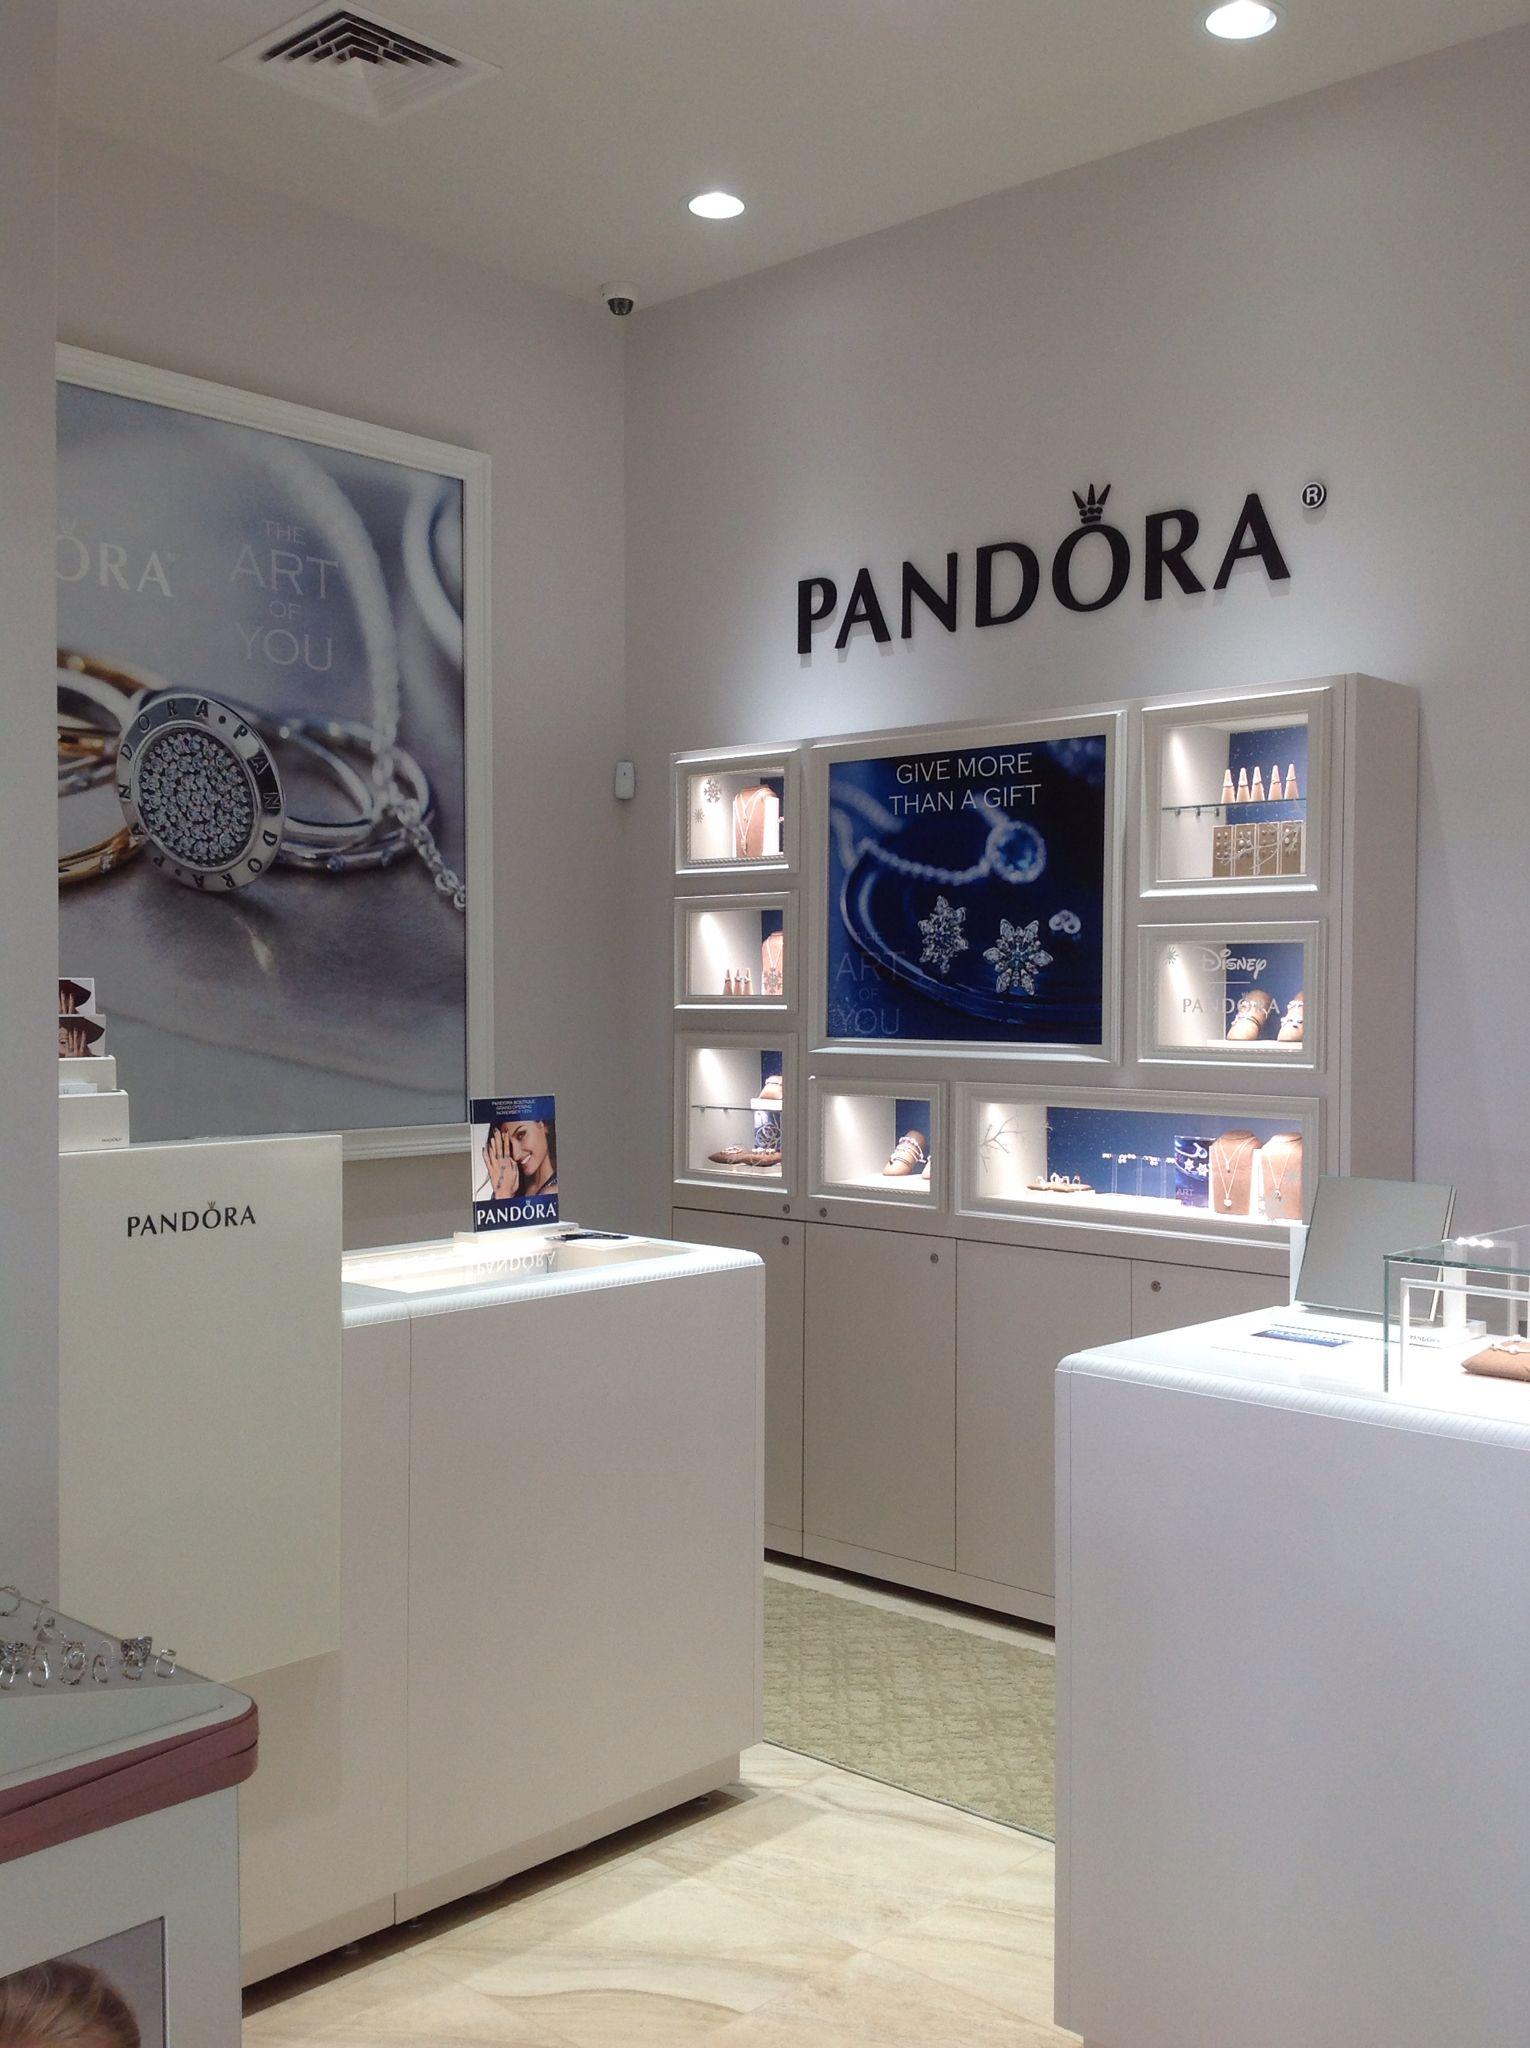 Pandora Roosevelt Field Mall : pandora, roosevelt, field, Extremely, Excited, Announce, GRAND, OPENING, PANDORA, Boutique!, Showroom, Robins, Spr…, Escaparates,, Negocios,, Vidrieras